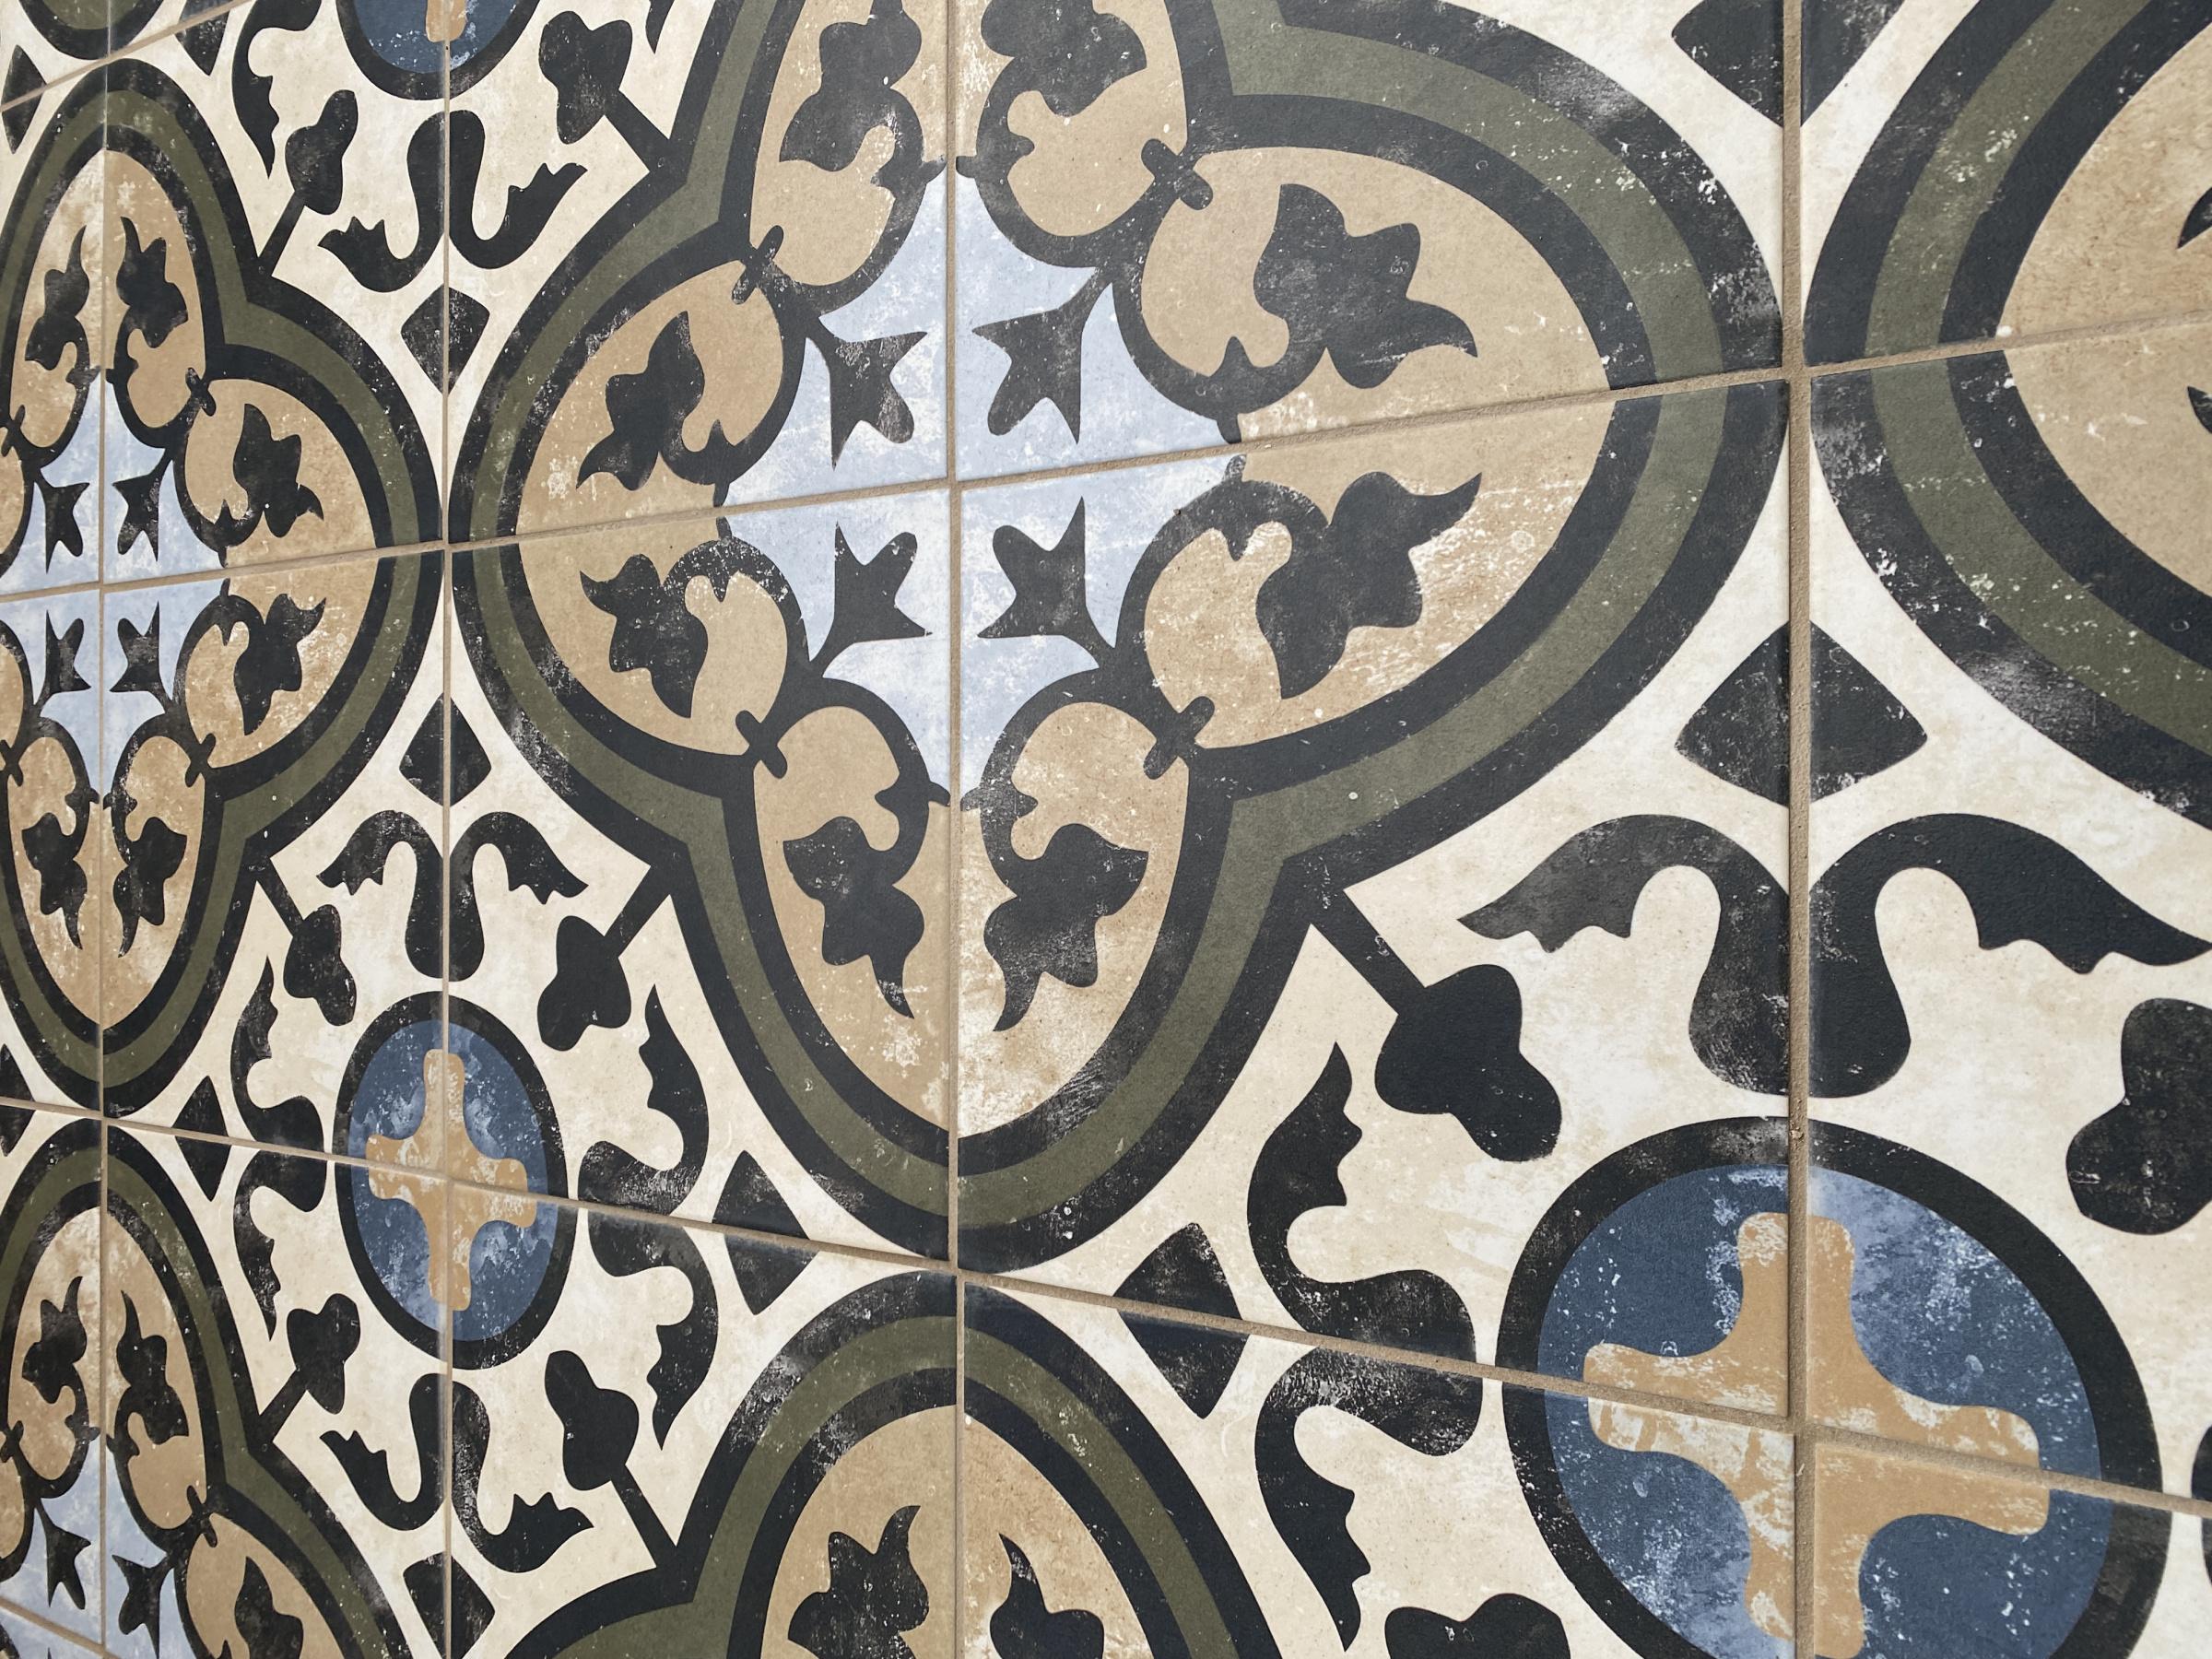 Awful Tile Work or Not?-img_1140.jpg